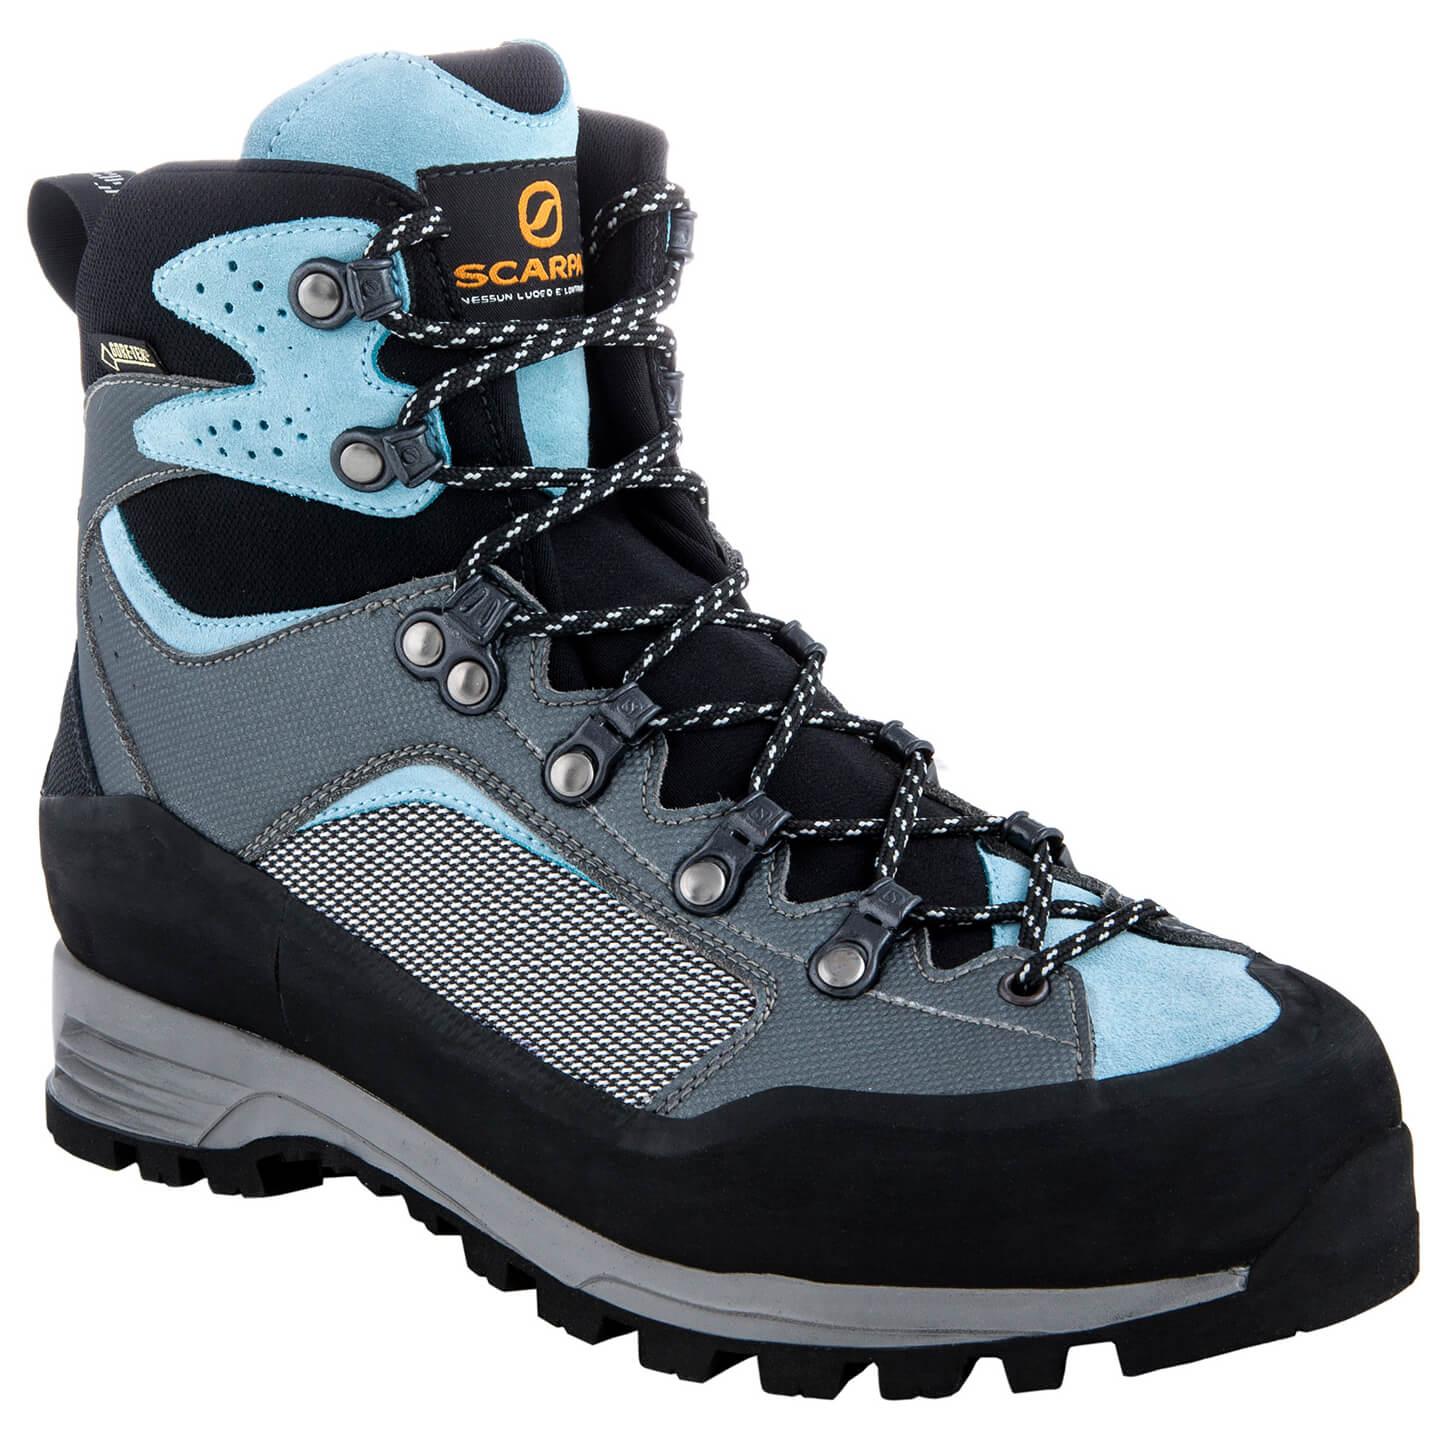 b8f9e7e71 Scarpa R-Evo Trek GTX - Walking Boots Women's | Free UK Delivery ...